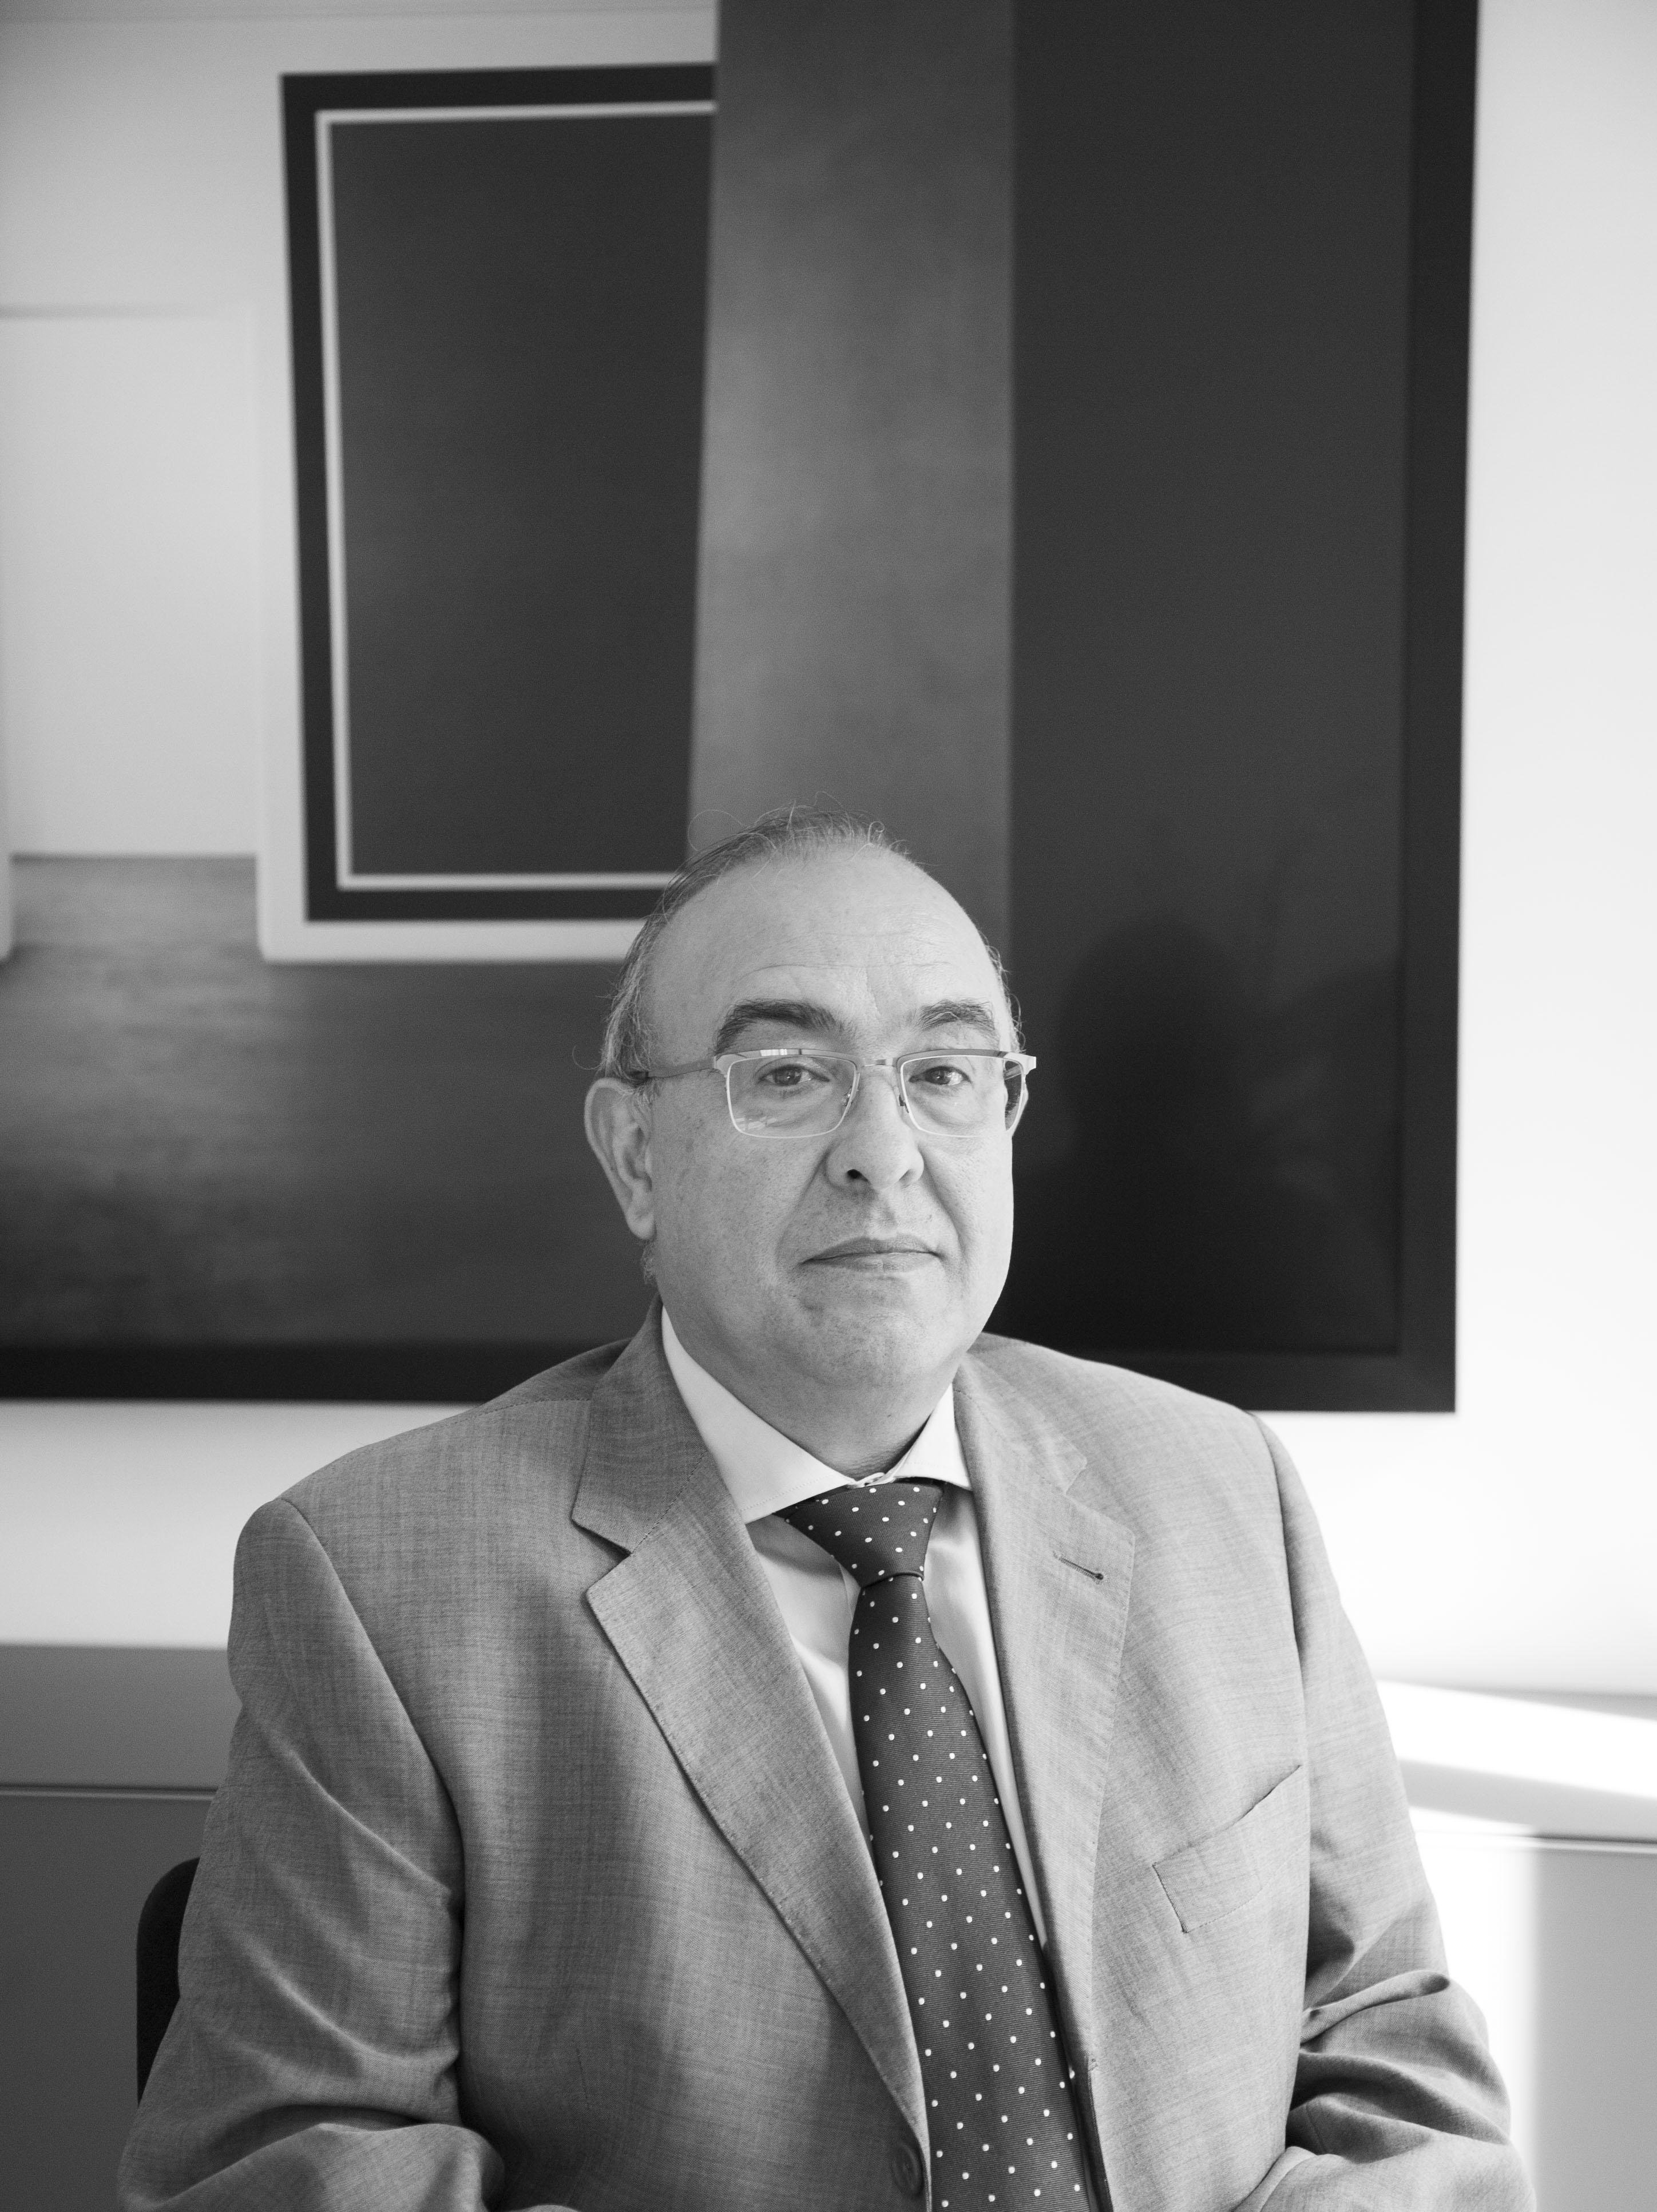 Francisco Javier Gómez Gutiérrez